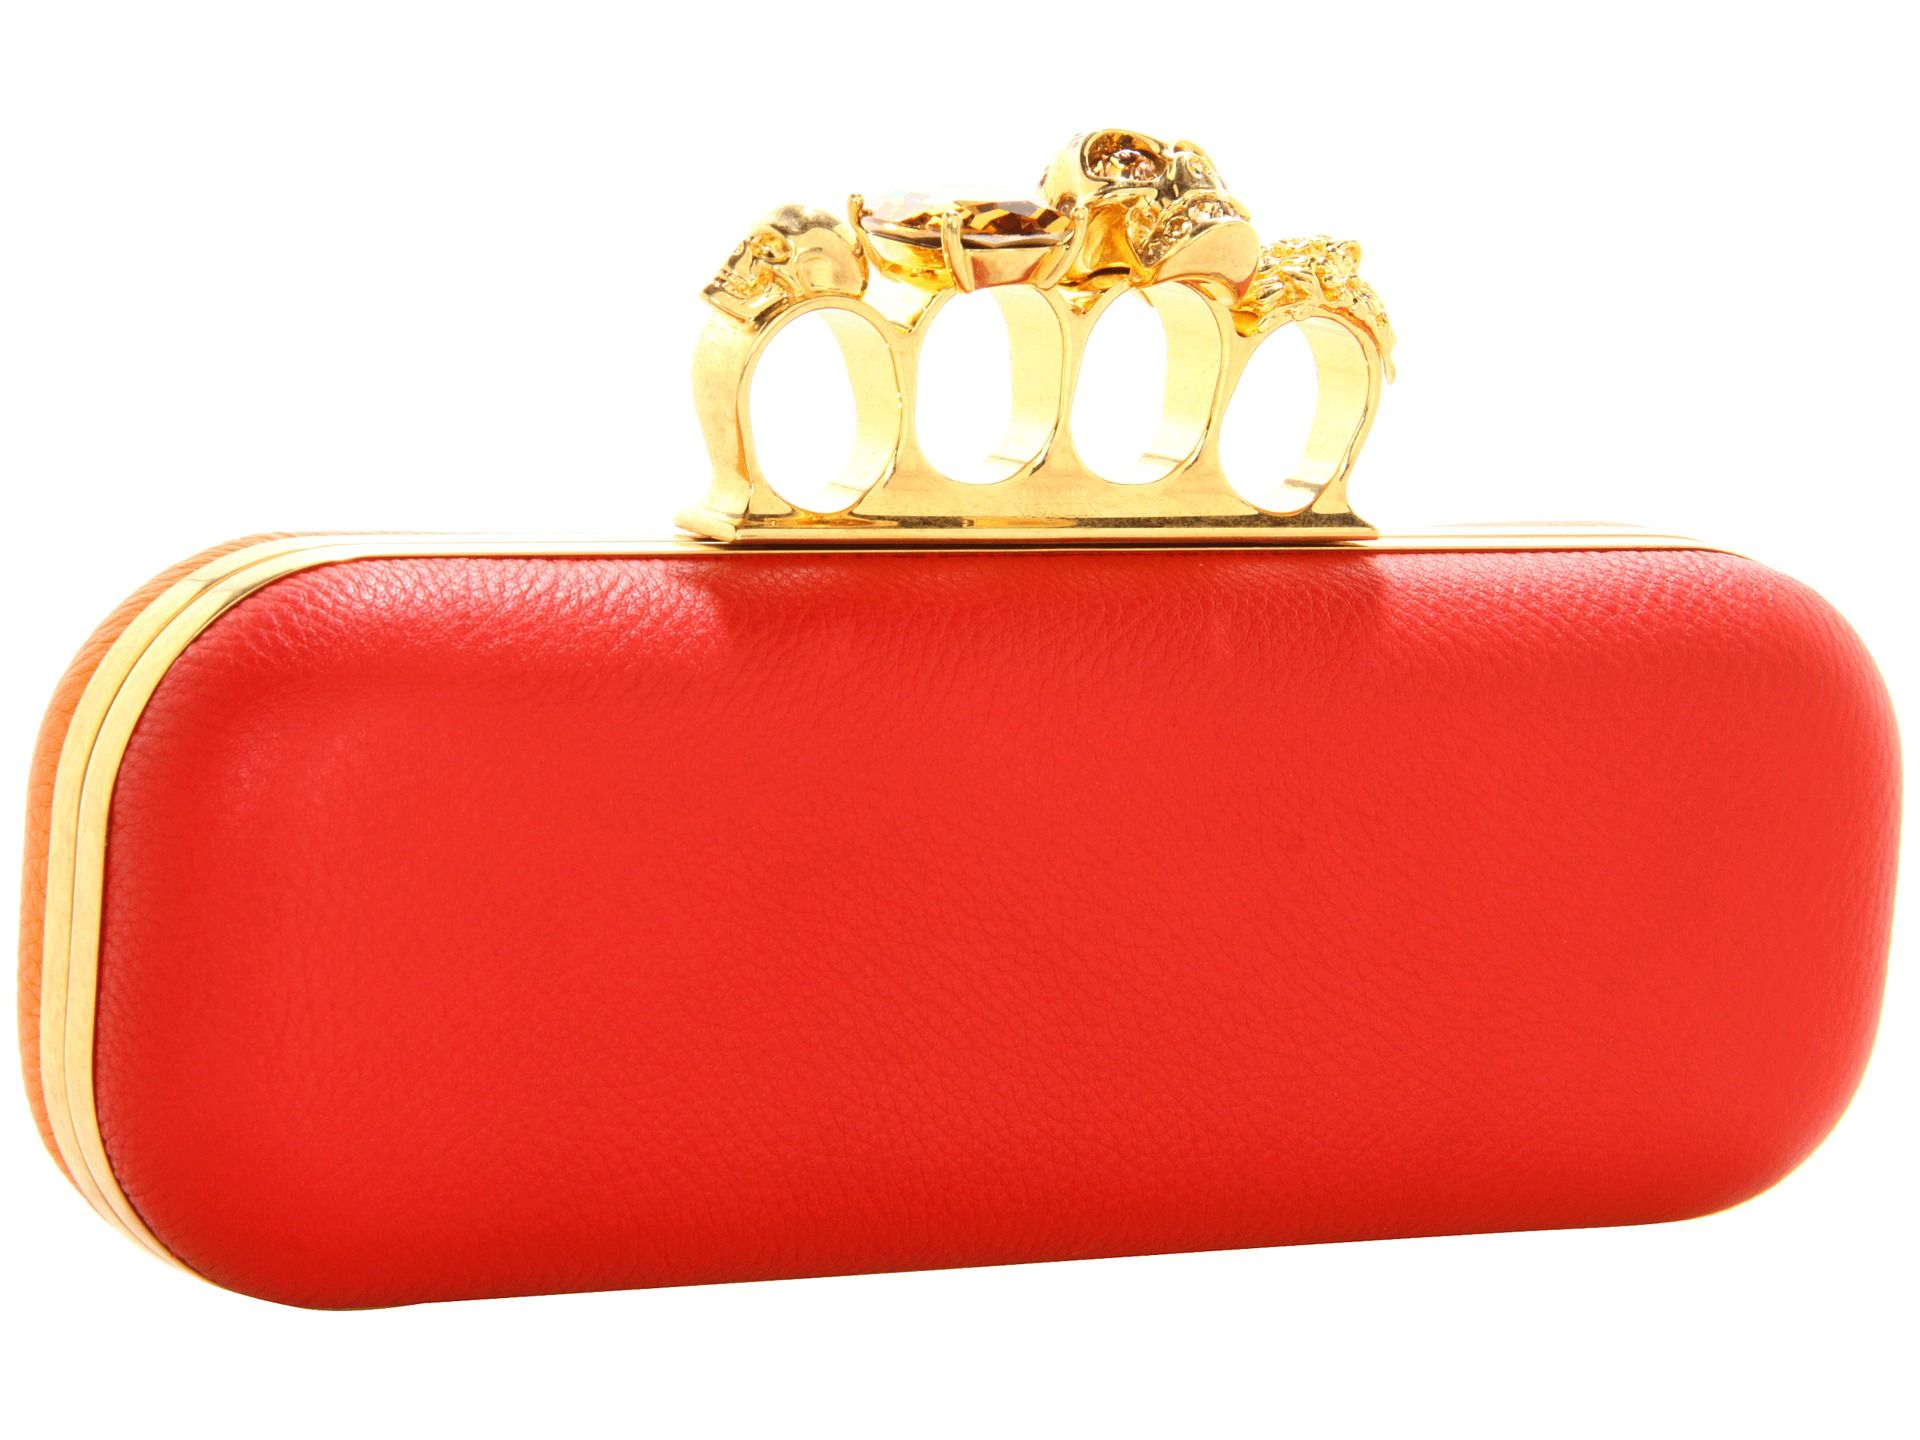 Alexander McQueen Knuckle Box Clutch Shiny